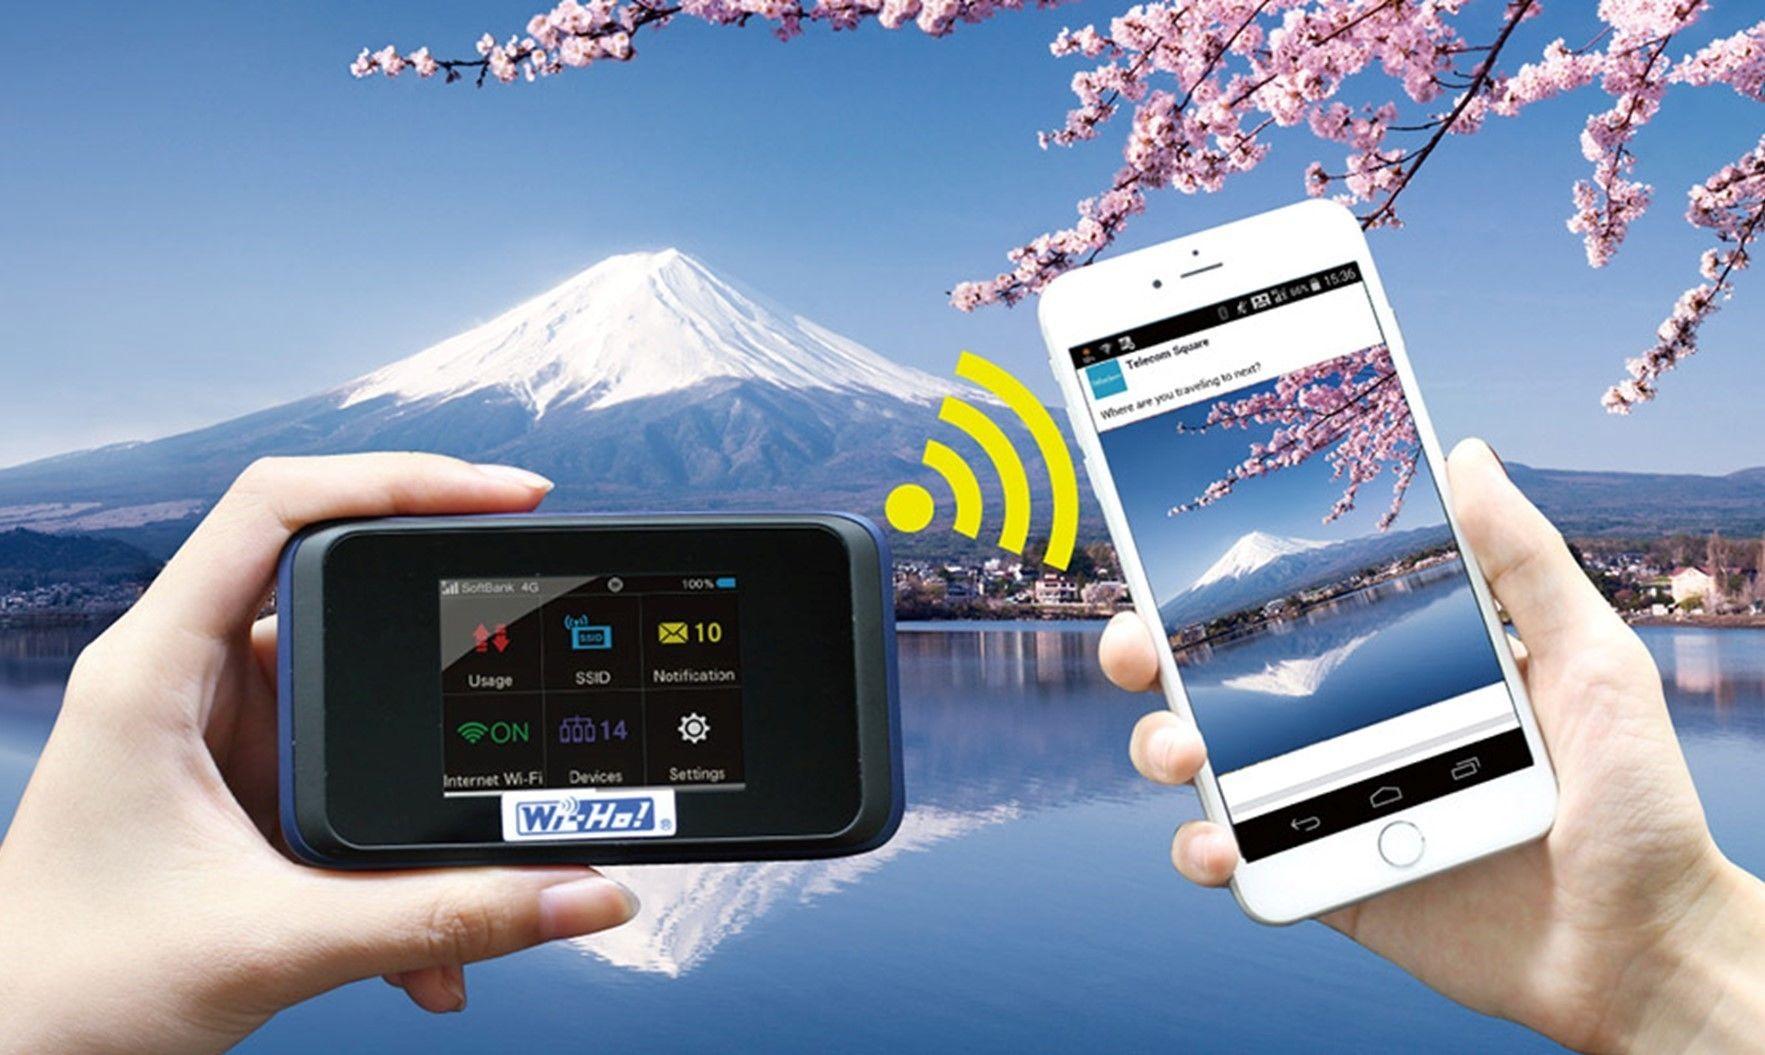 Wi-Fi Router Rental from Narita International Airport